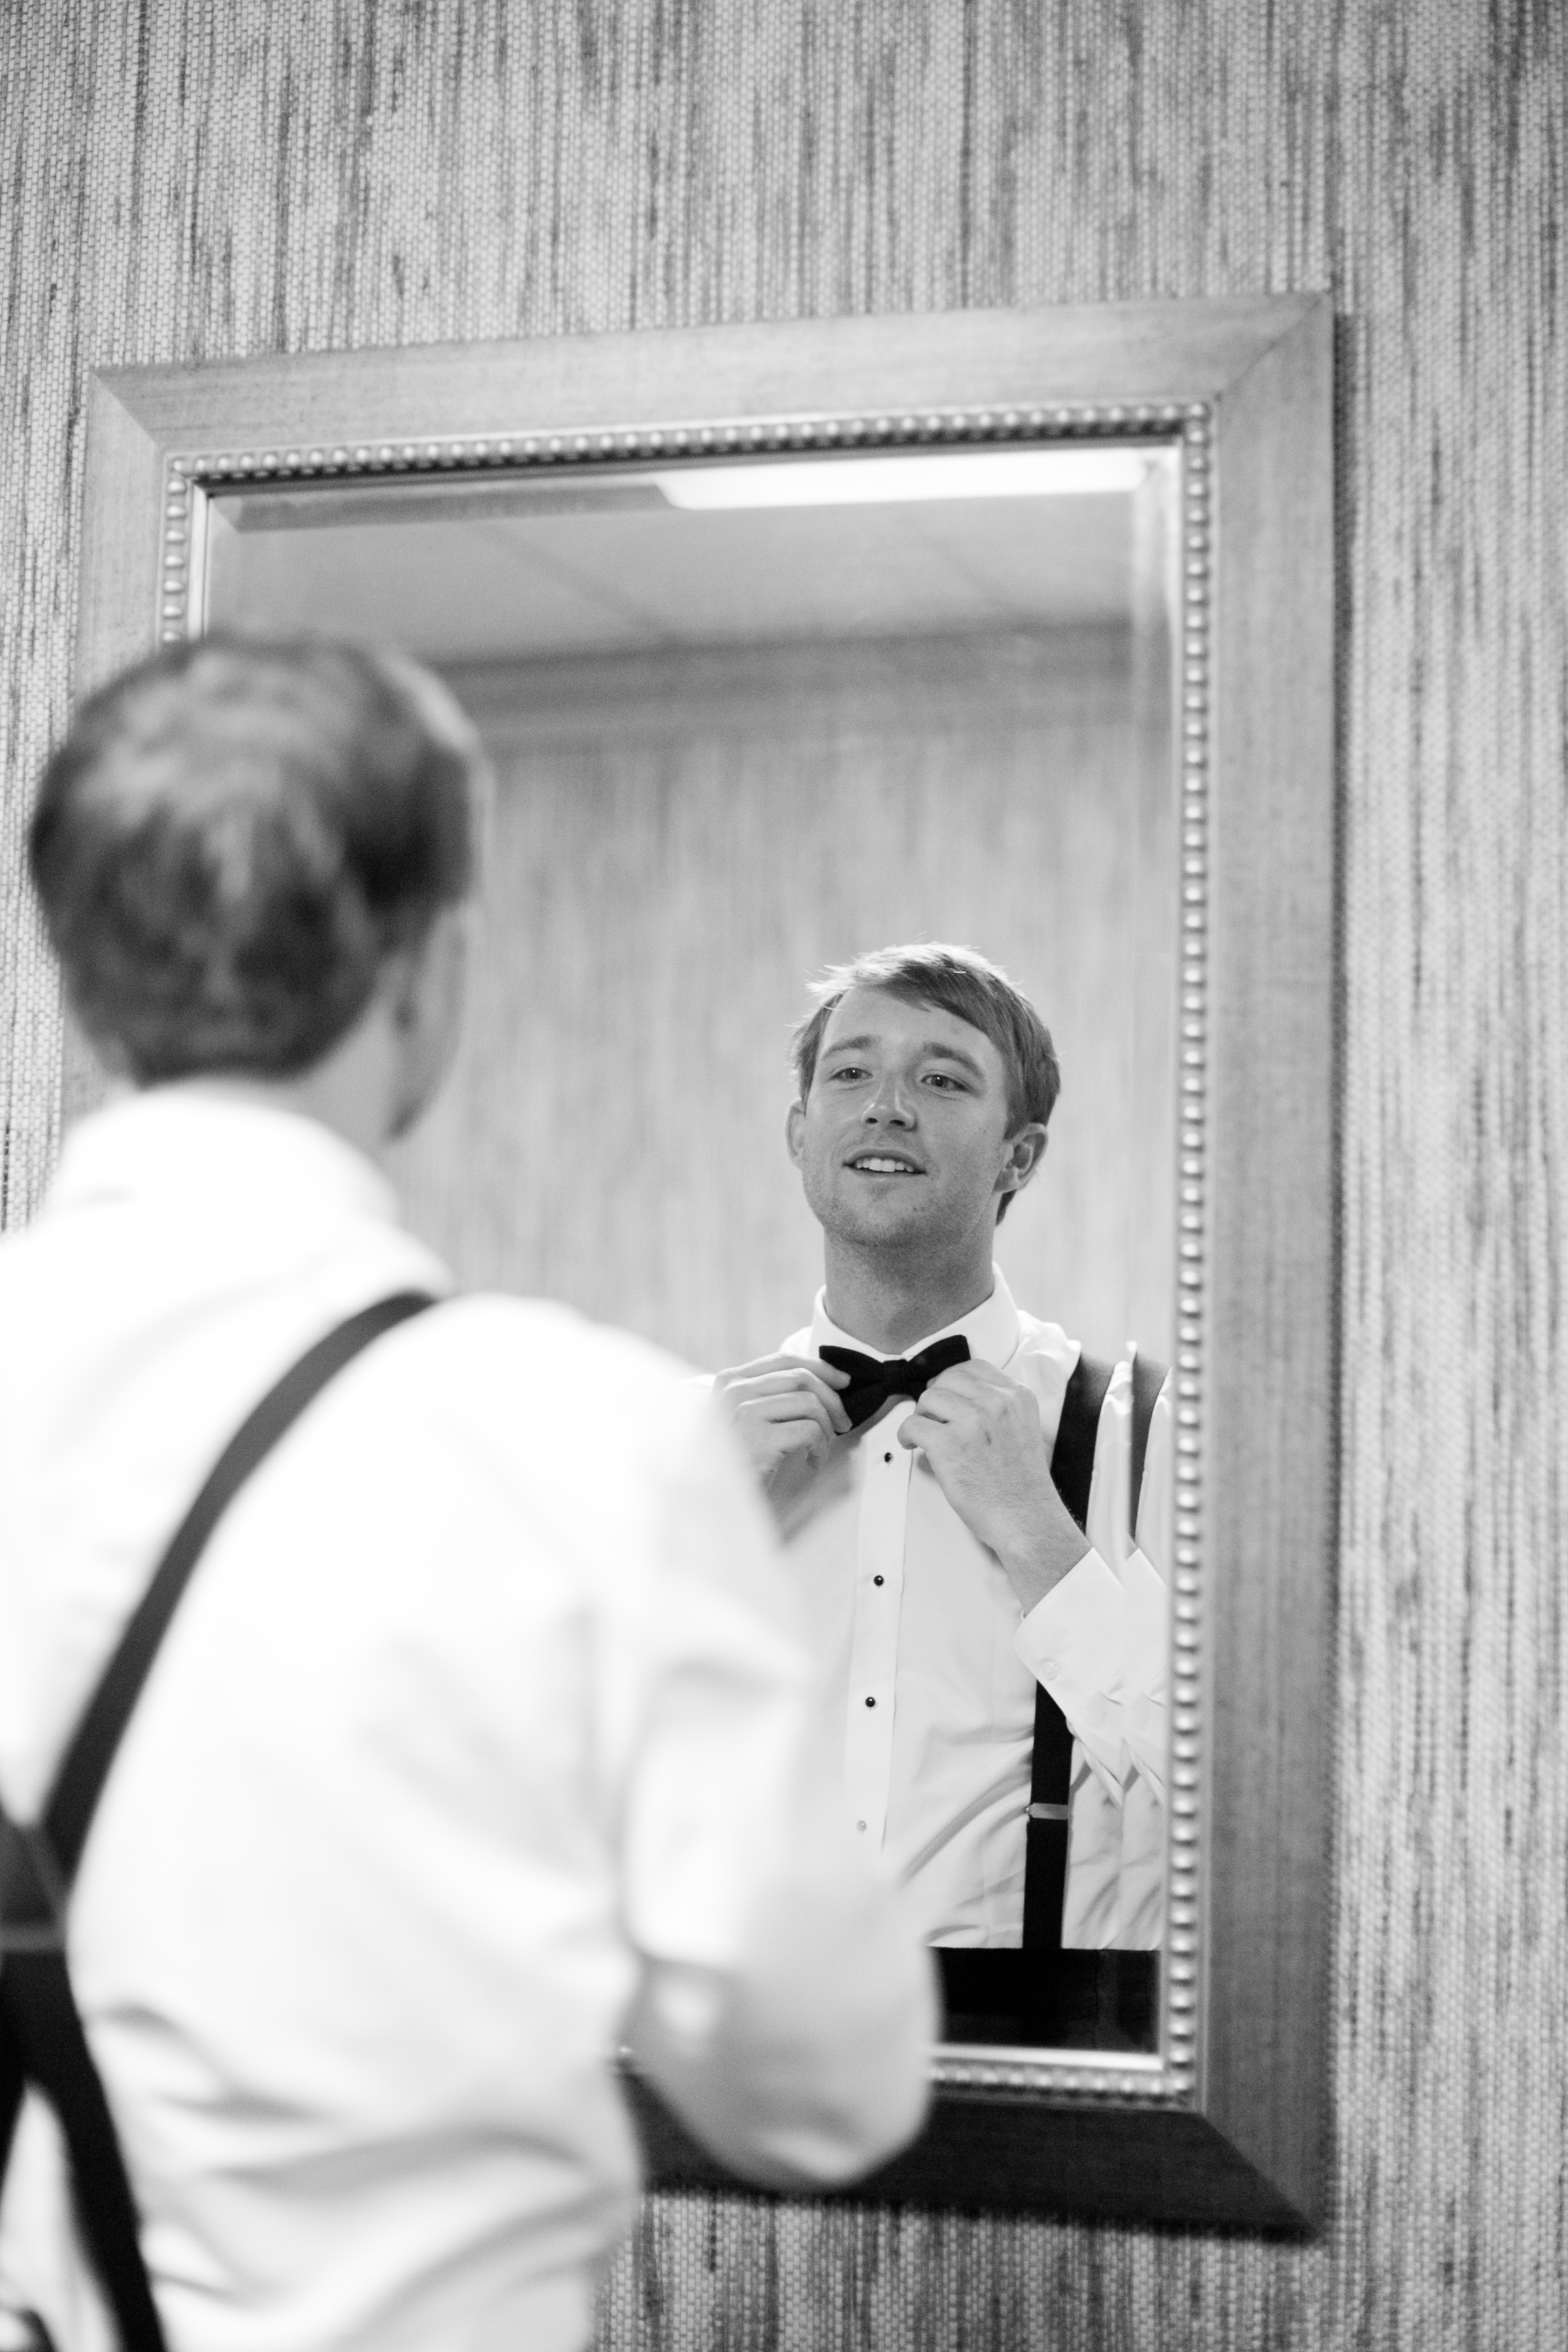 701_whaley_wedding_22.jpg